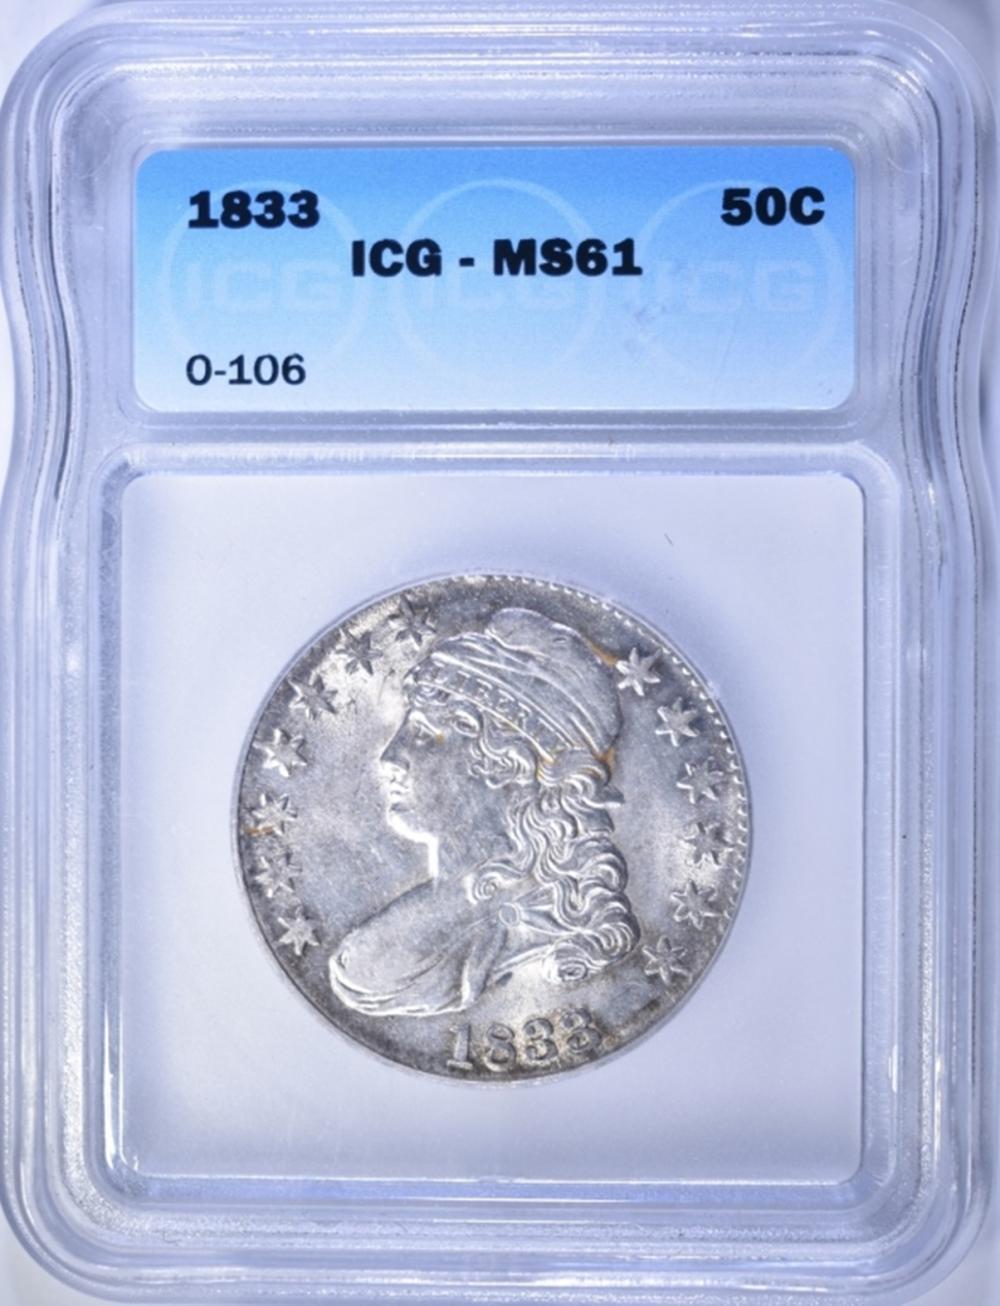 1833 CAPPED BUST HALF DOLLAR  ICG  MS-61